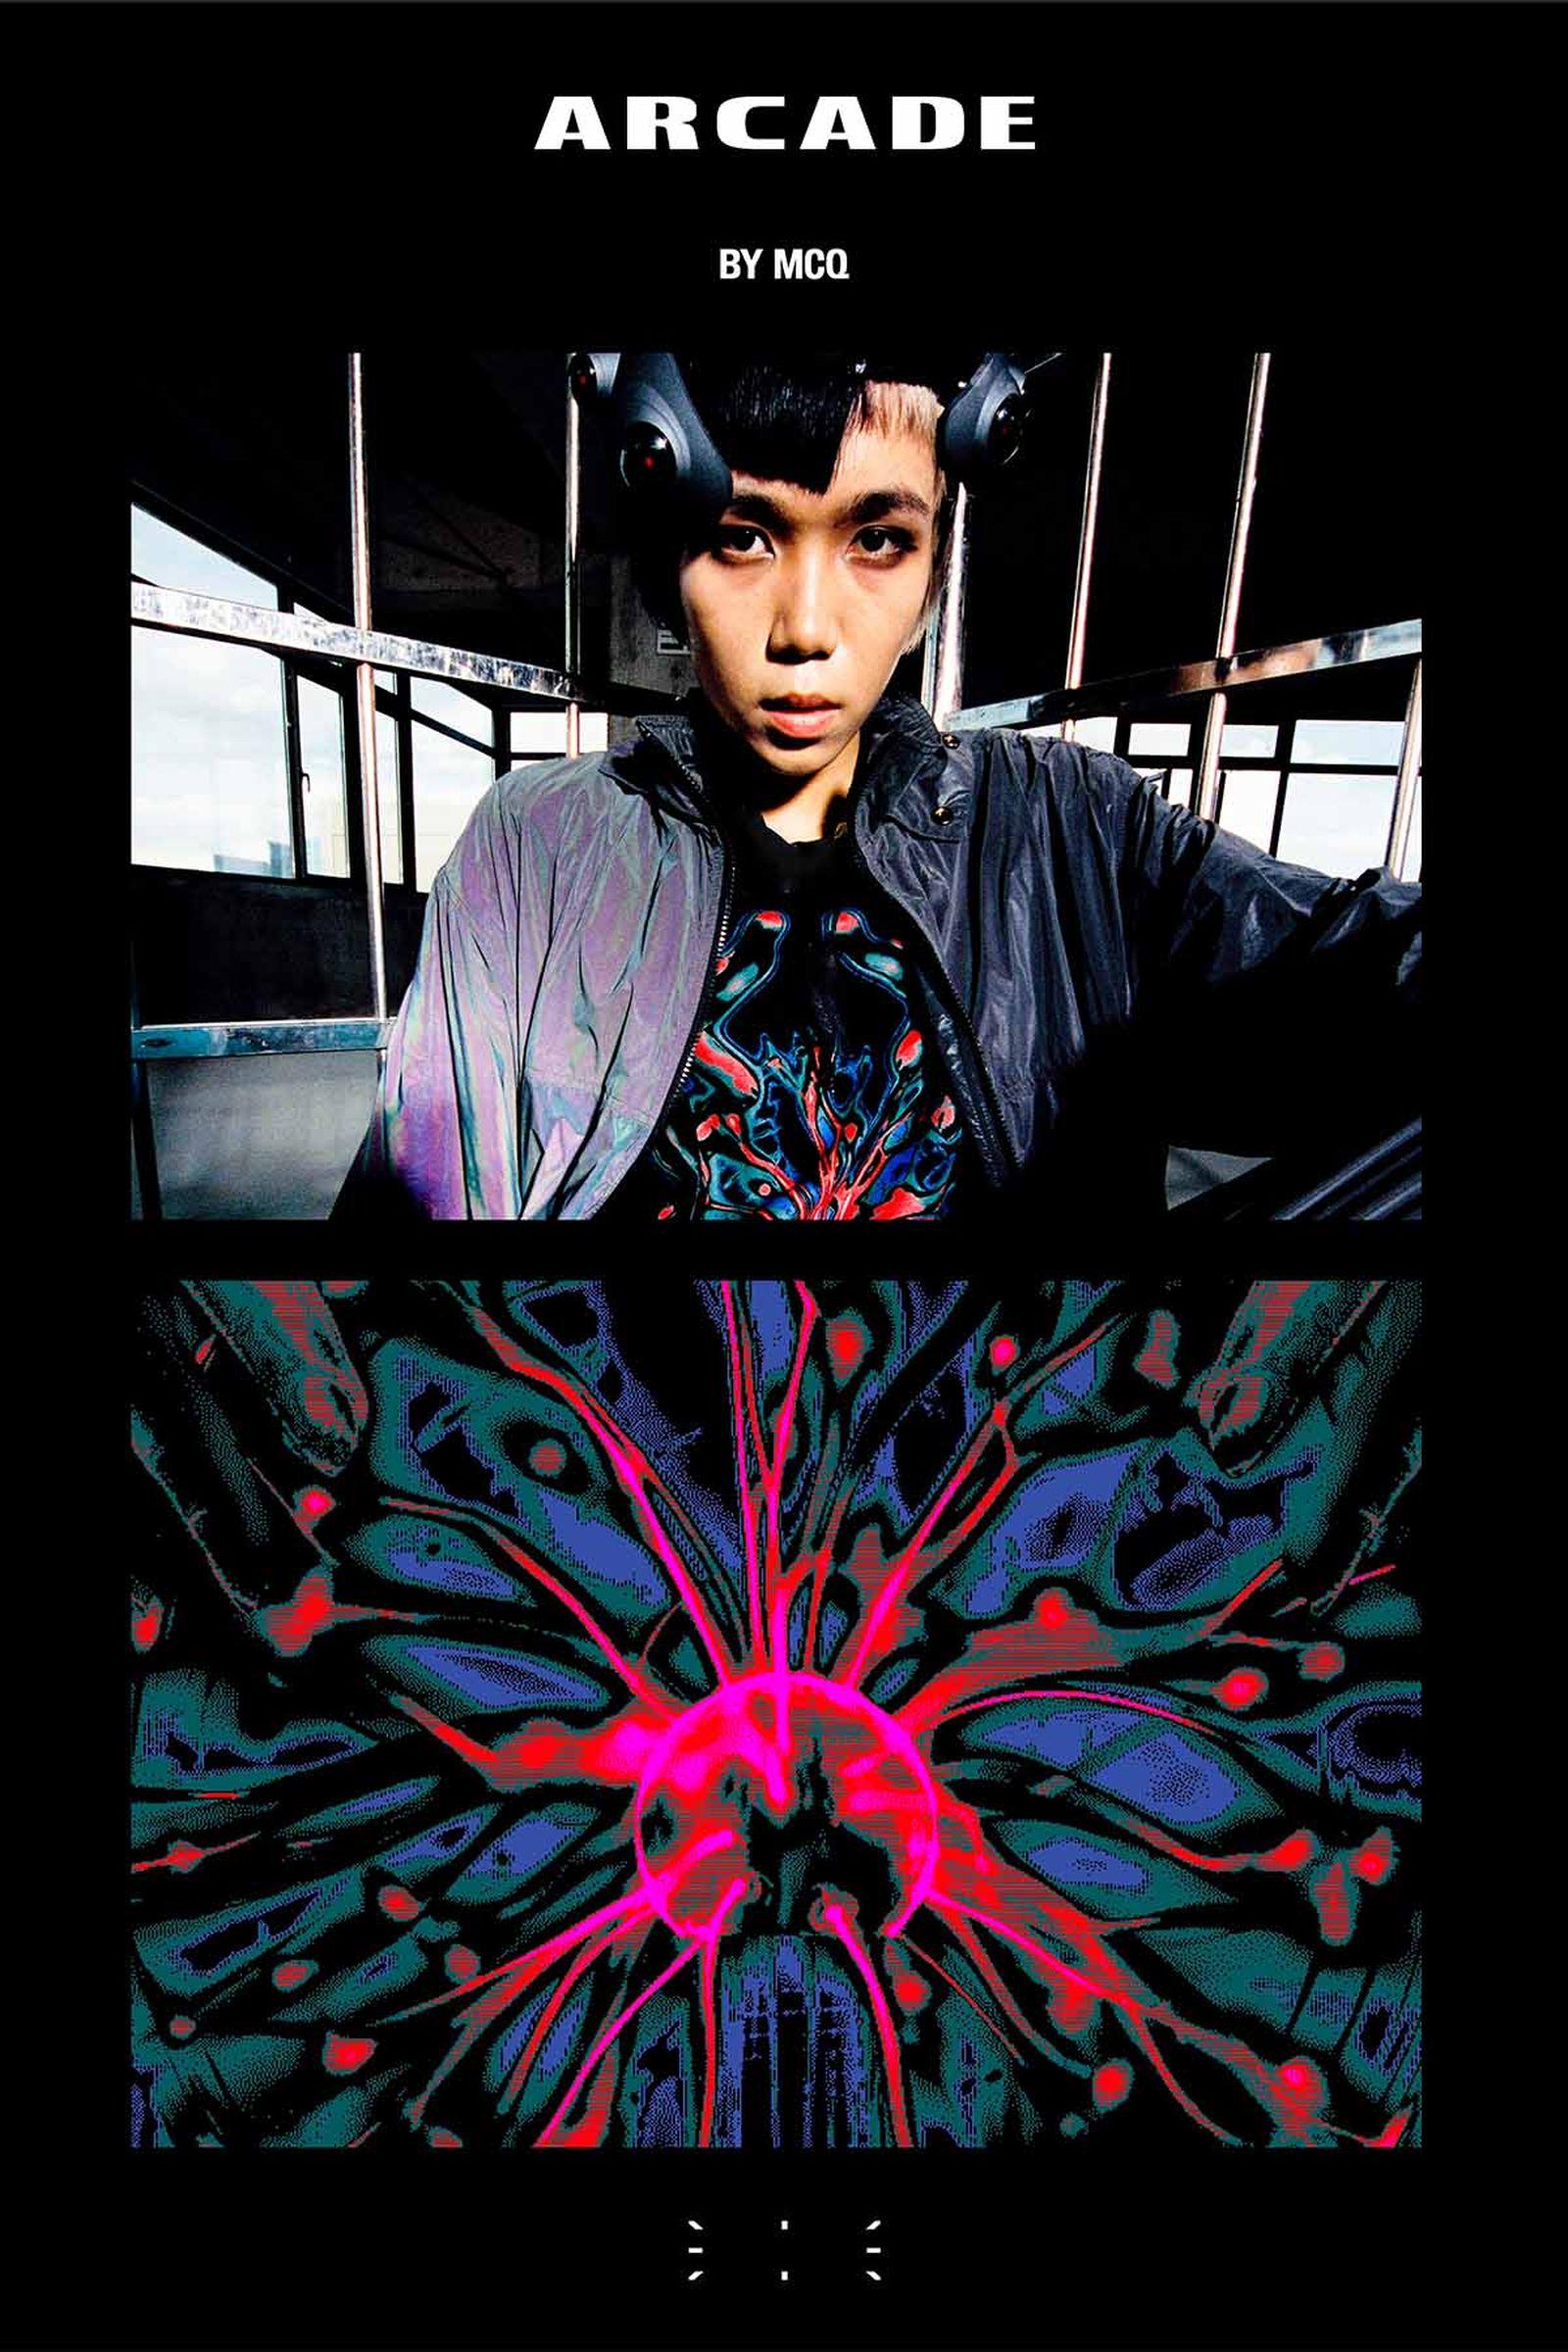 mcq-arcade-03